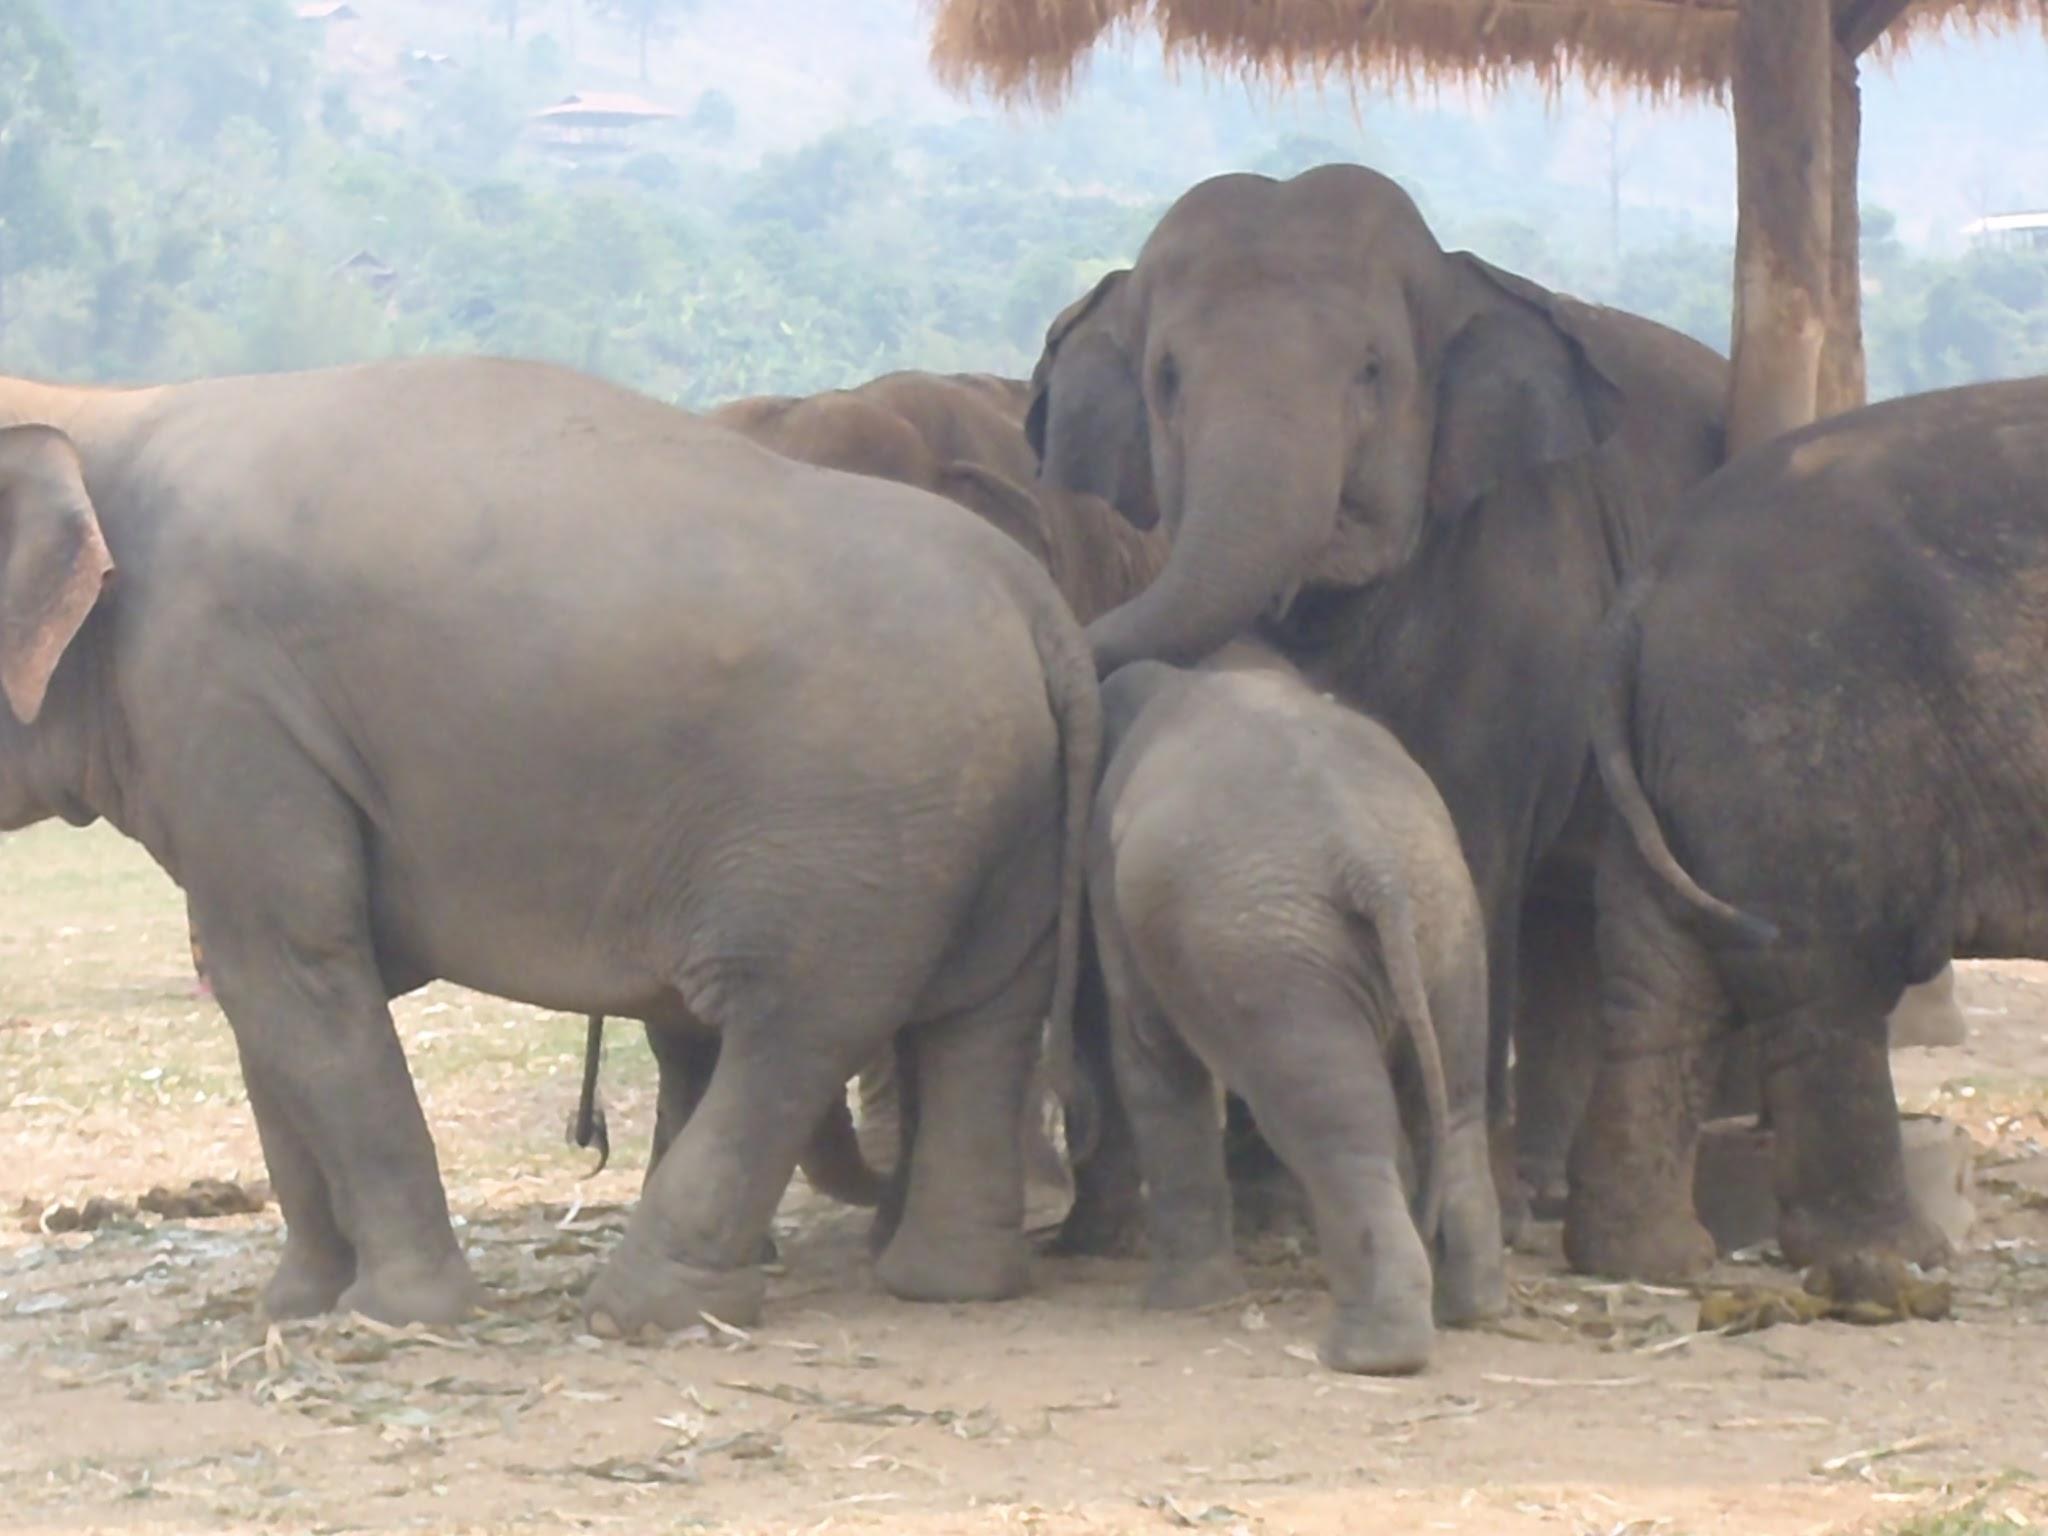 Elephant Nature Park – Chaing Mai, Thailand